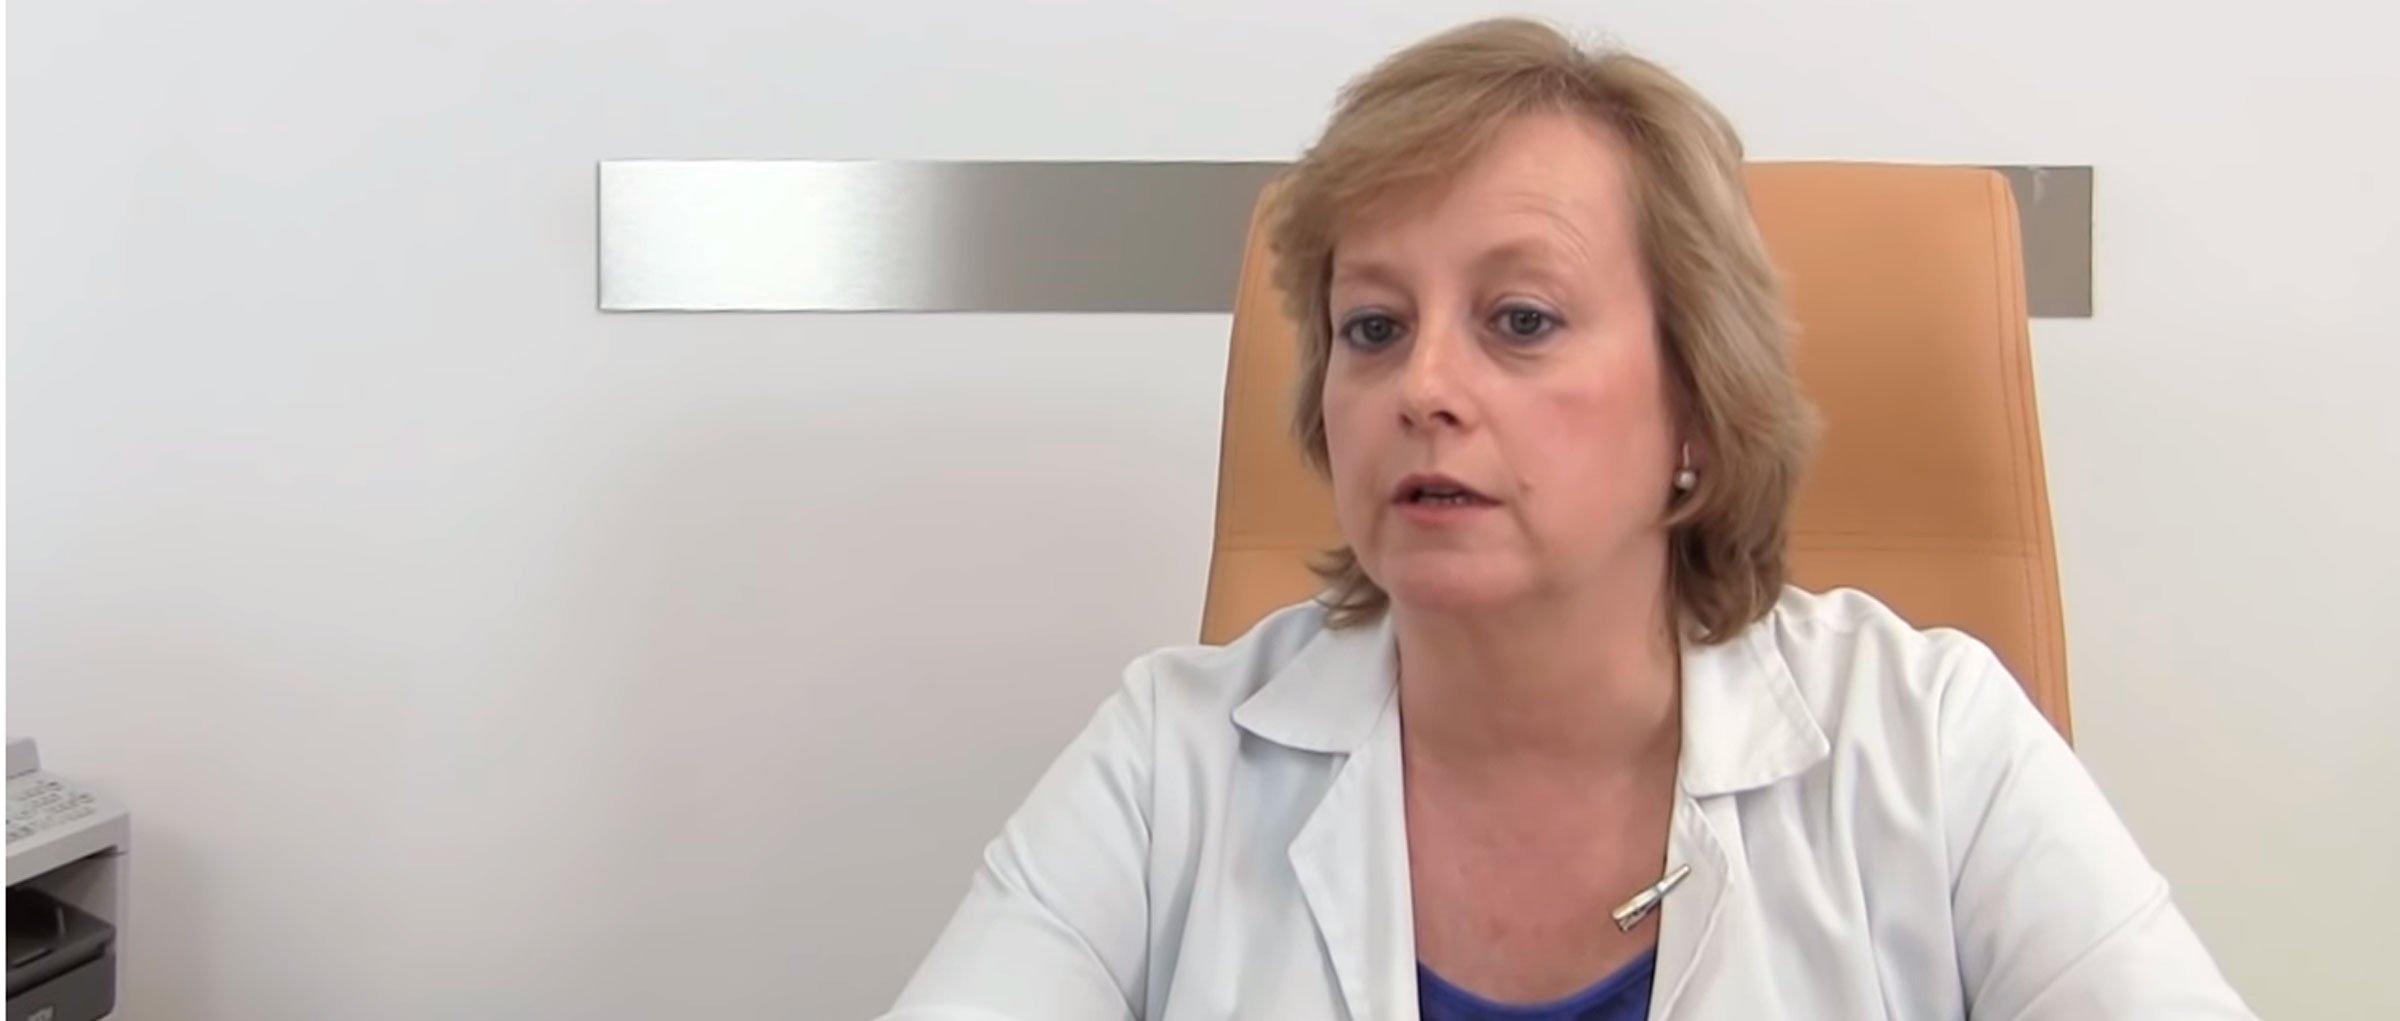 Dr Elena Martín about hydrosalpinx